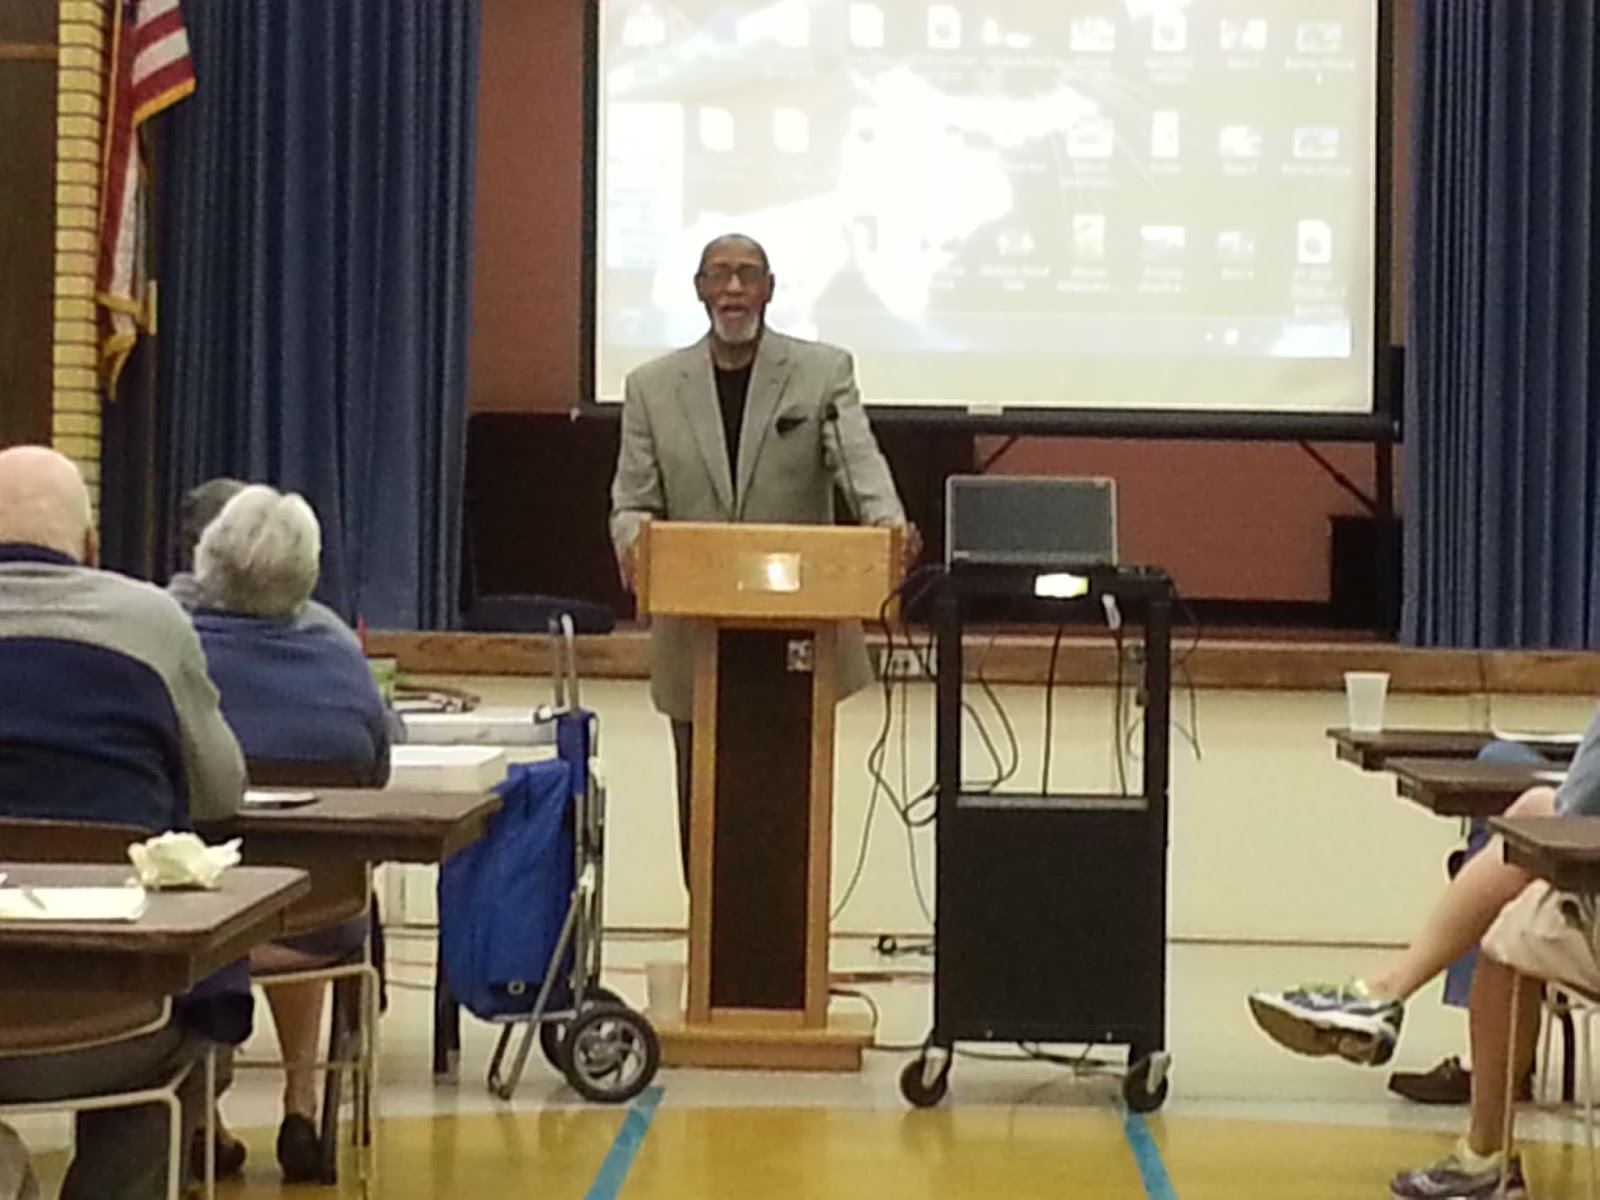 Sumner County Kansas History & Genealogy: Programs